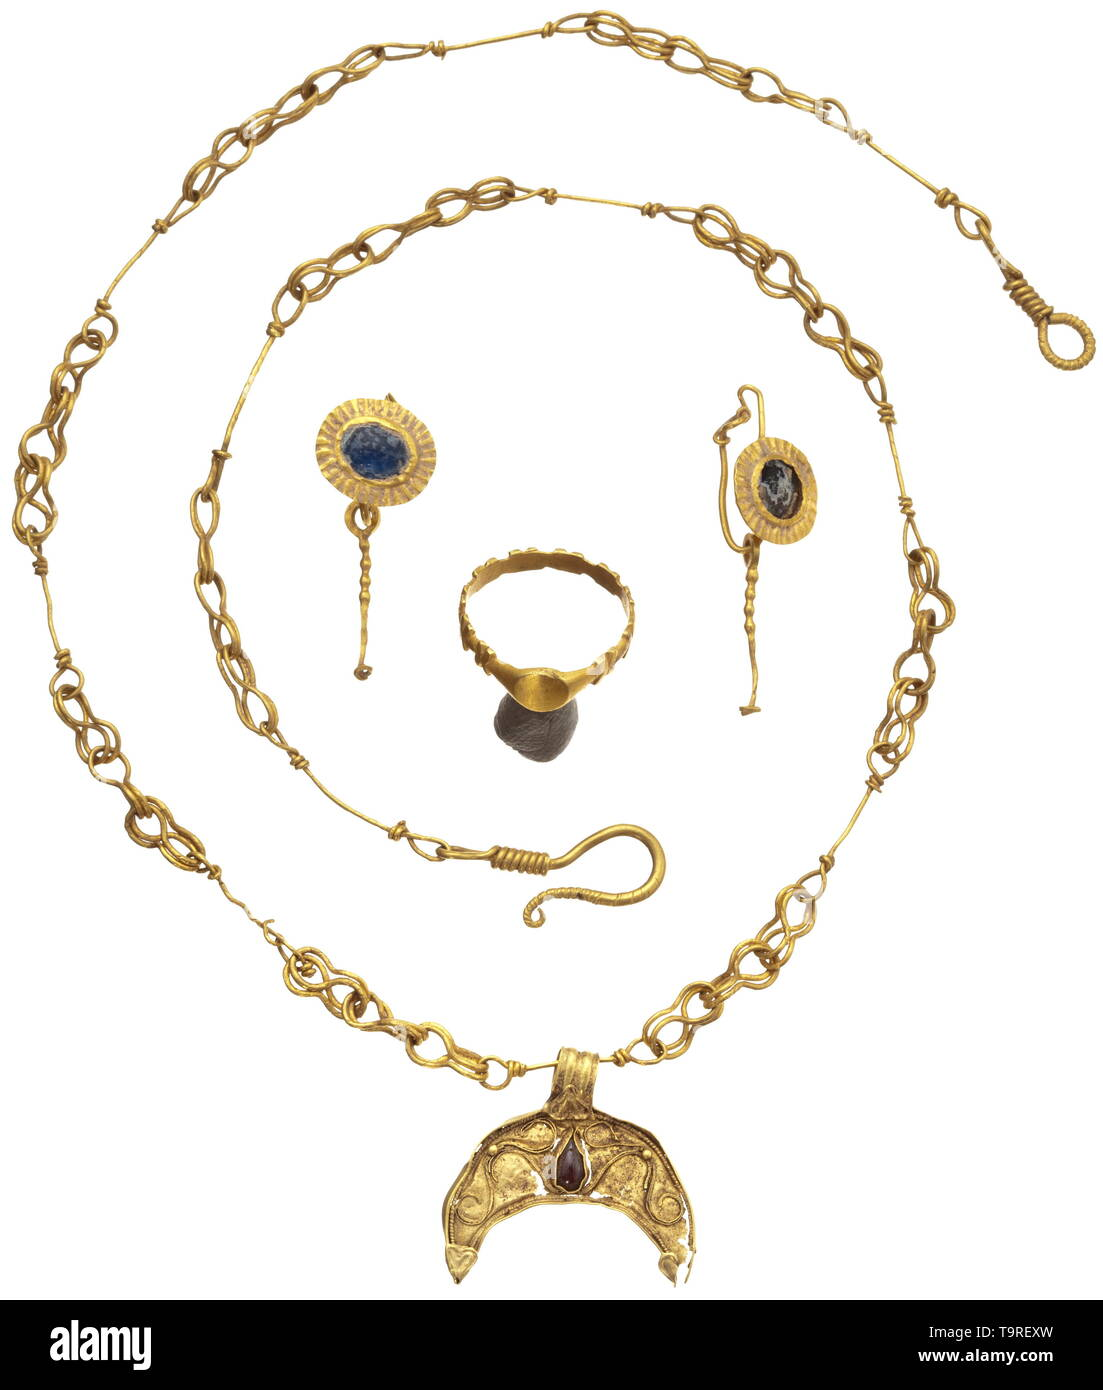 Gold Pendant Necklace Stock Photos & Gold Pendant Necklace Stock